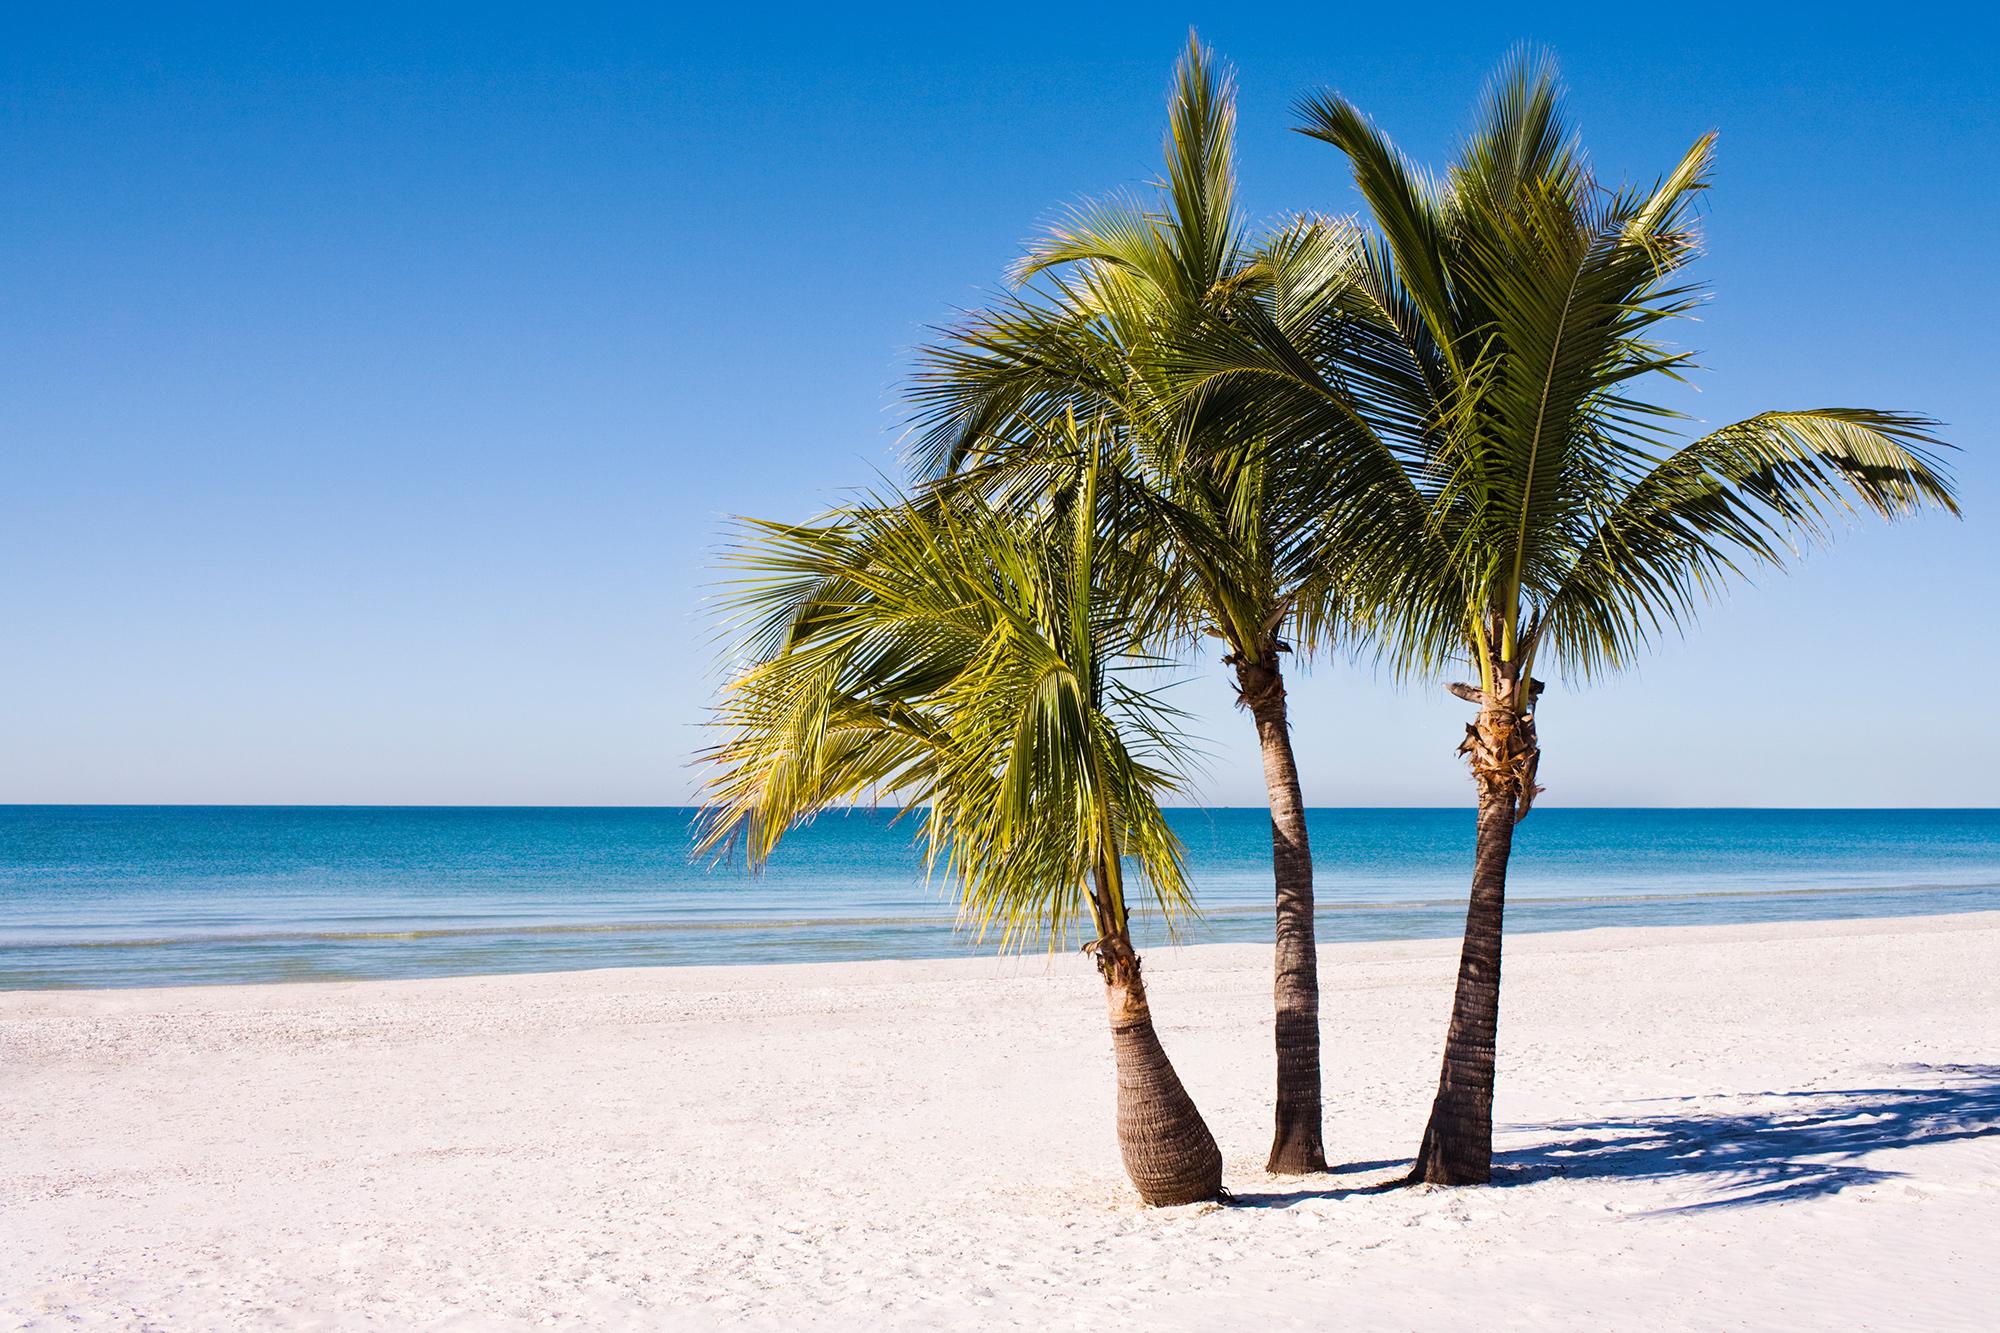 last minute karibik strandurlaub in der karibik mit tui. Black Bedroom Furniture Sets. Home Design Ideas